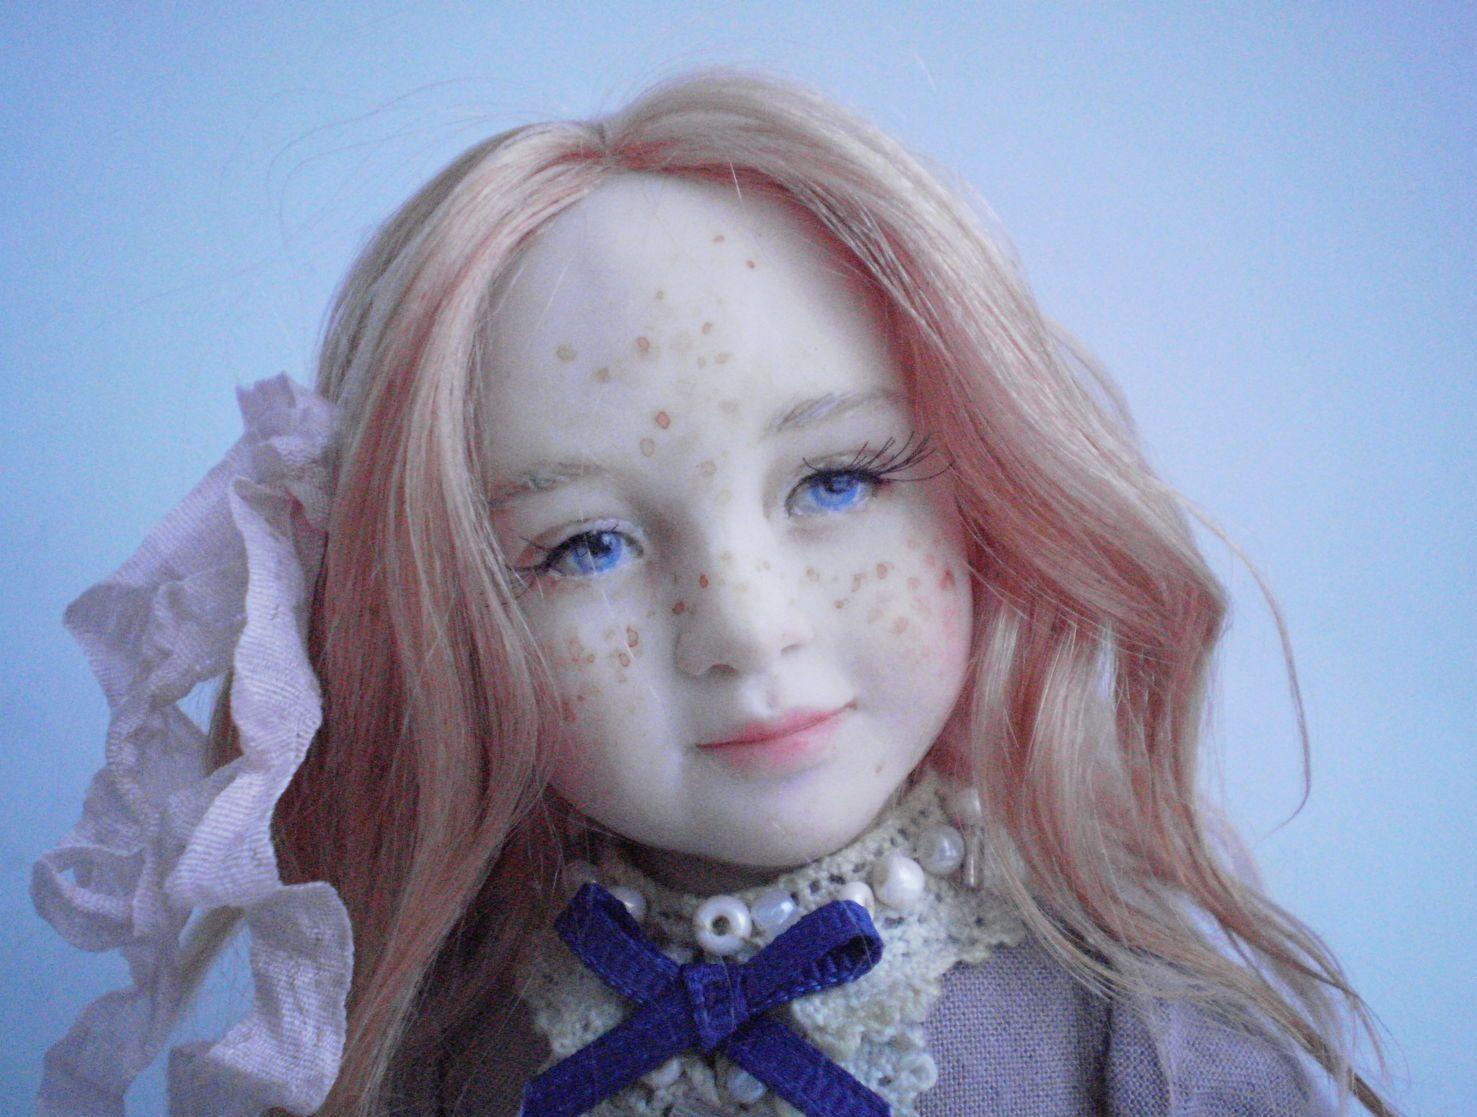 Девочка с веснушками